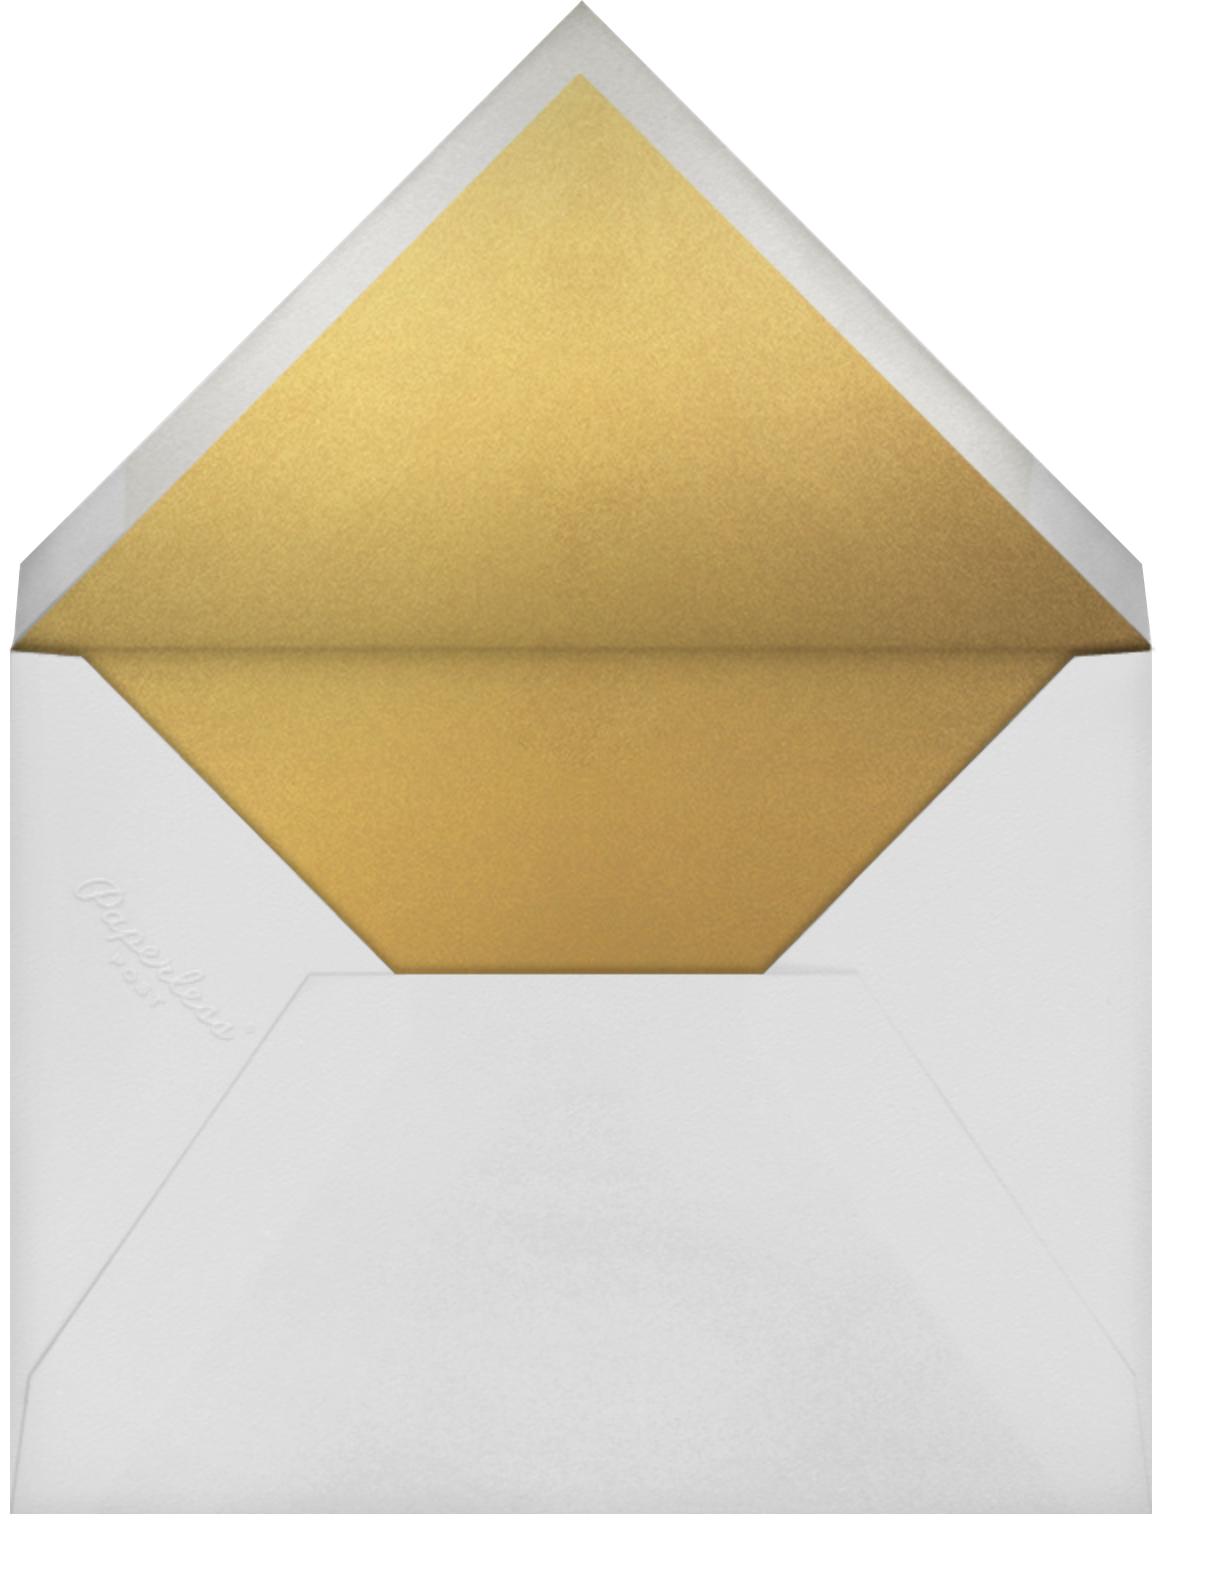 Mama Bear Hug - Paperless Post - Vaccine parties - envelope back